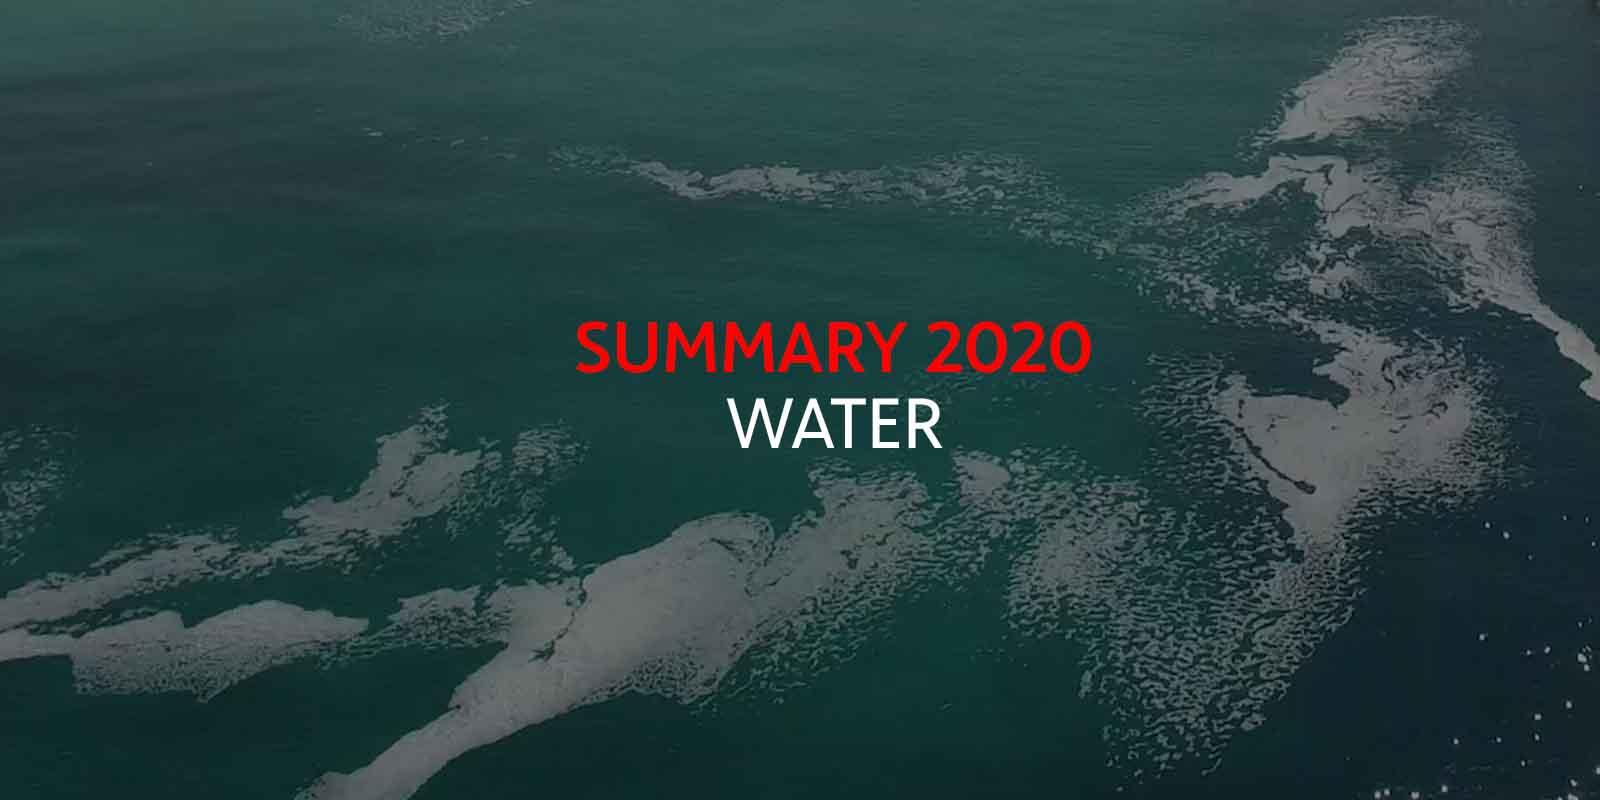 Water Summary year 2020